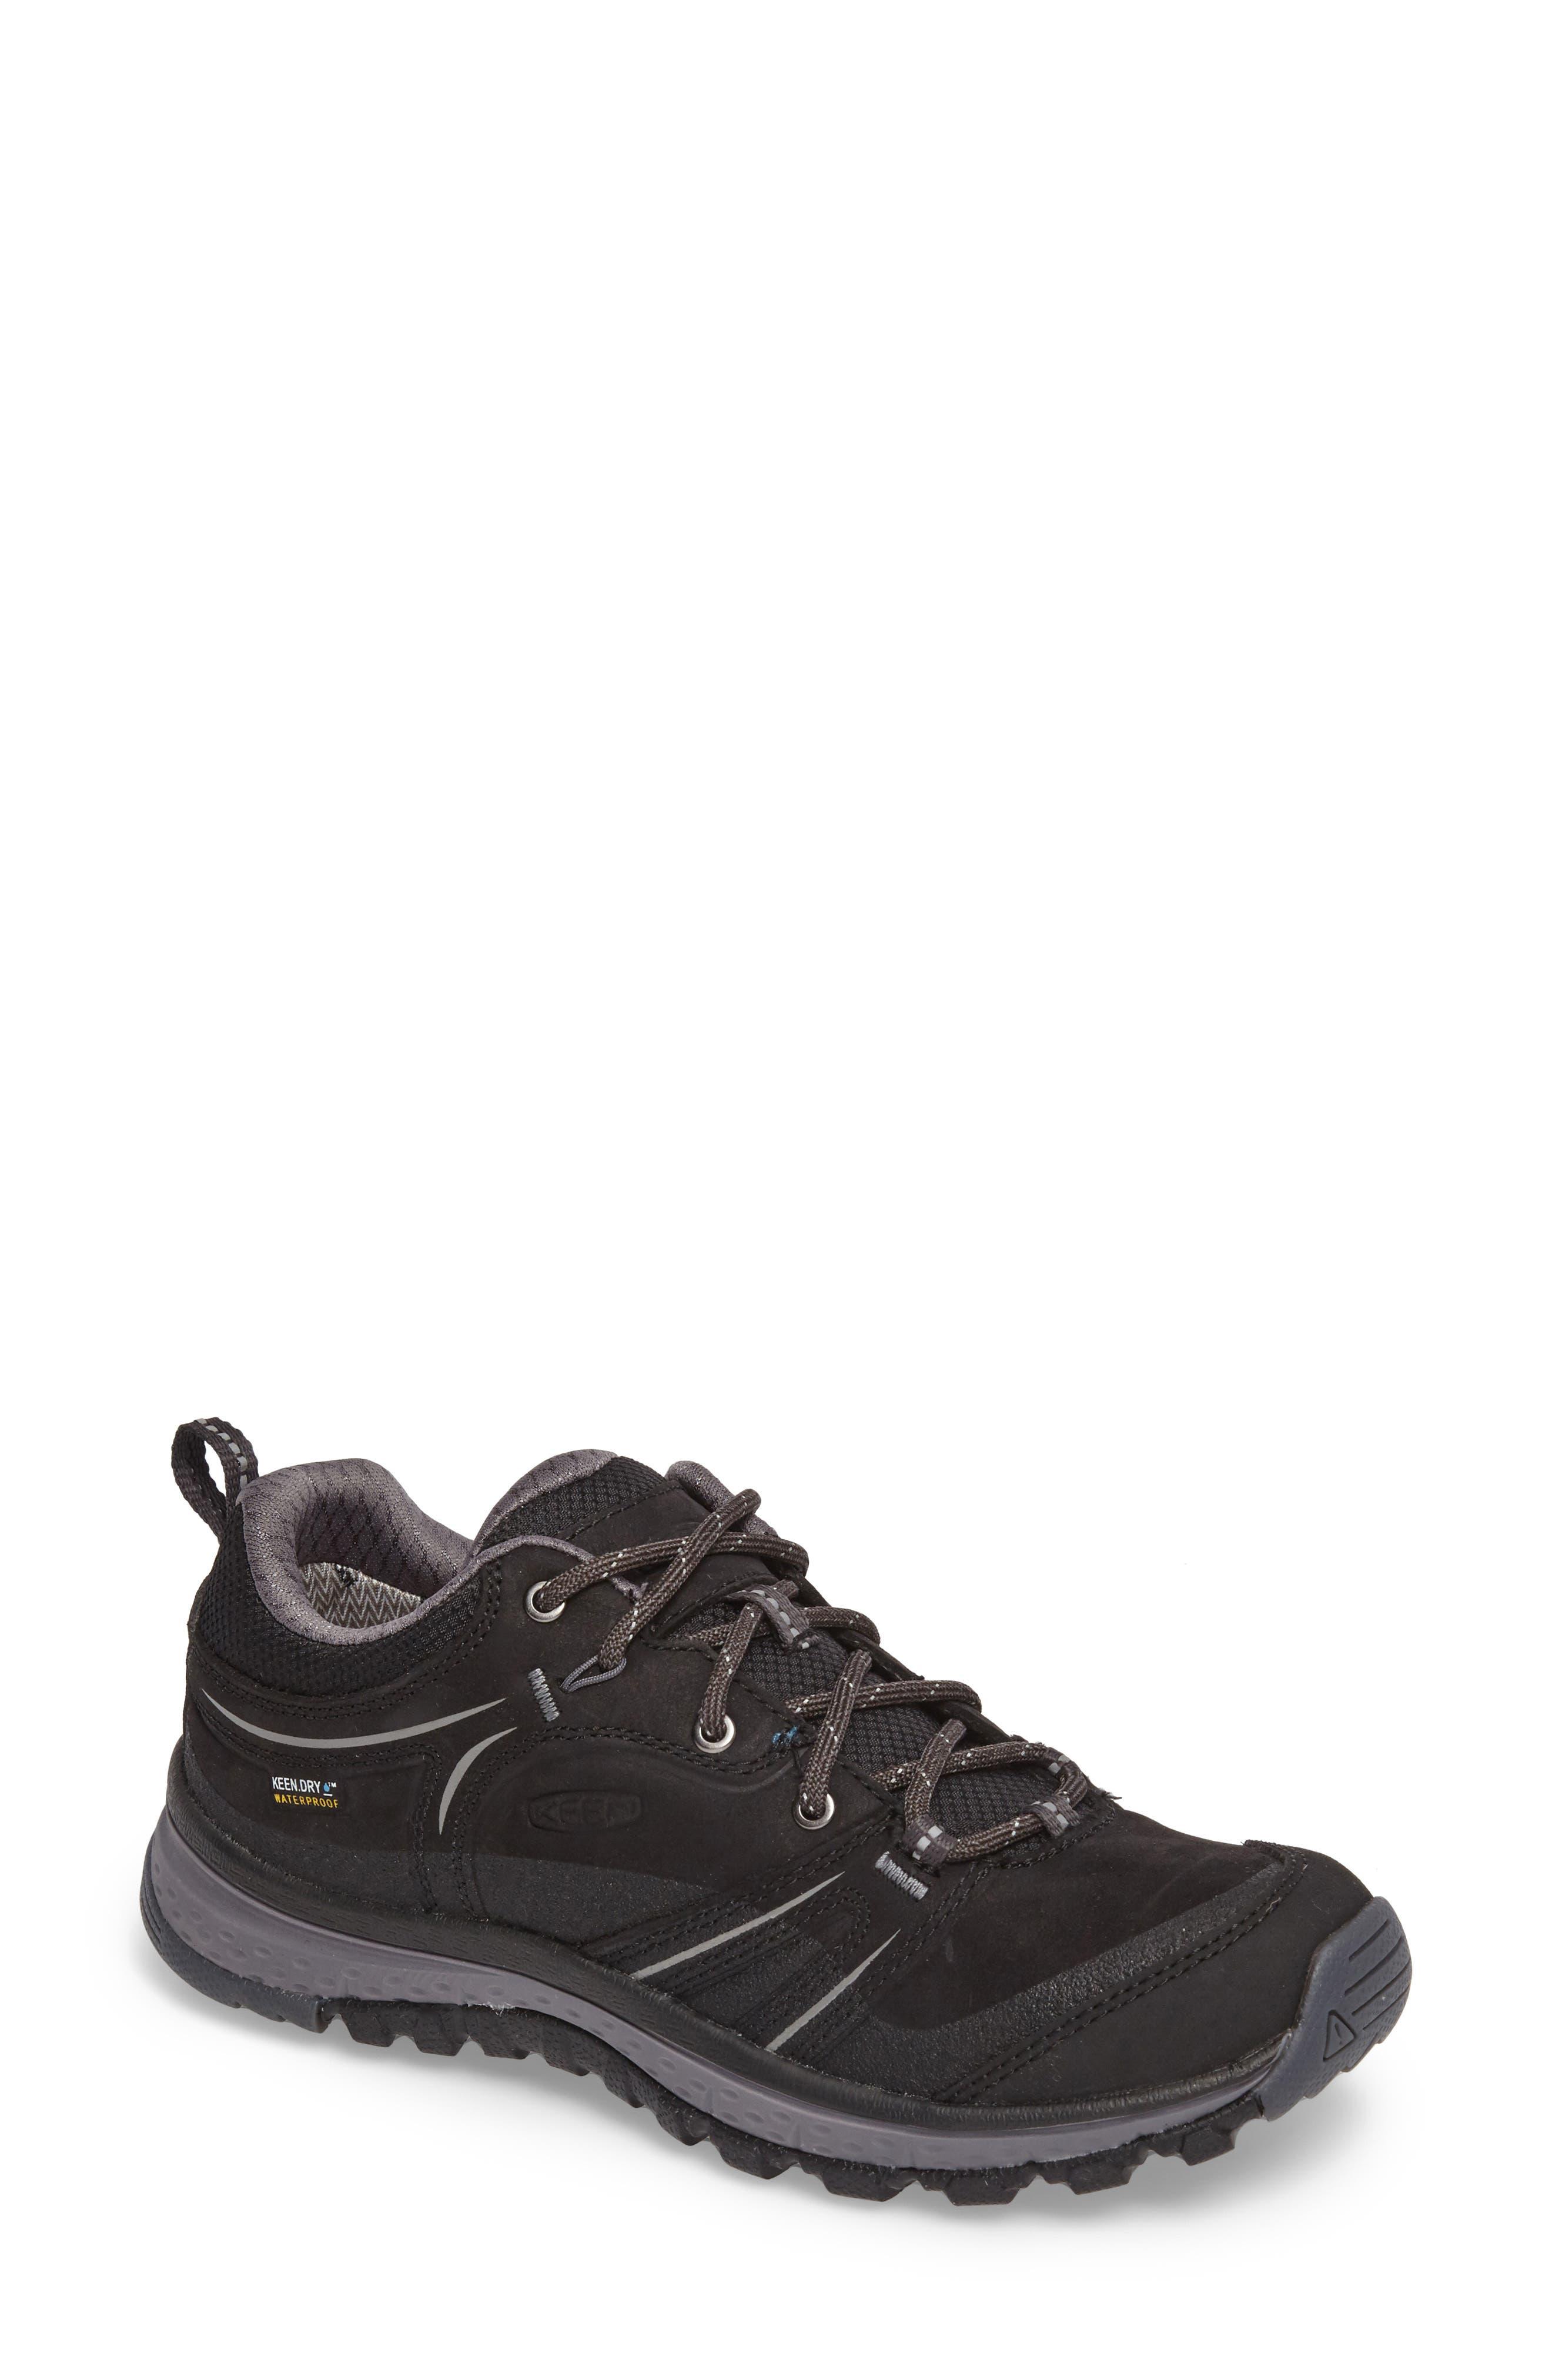 Terradora Waterproof Hiking Shoe,                         Main,                         color, Black/ Steel Grey Nubuck